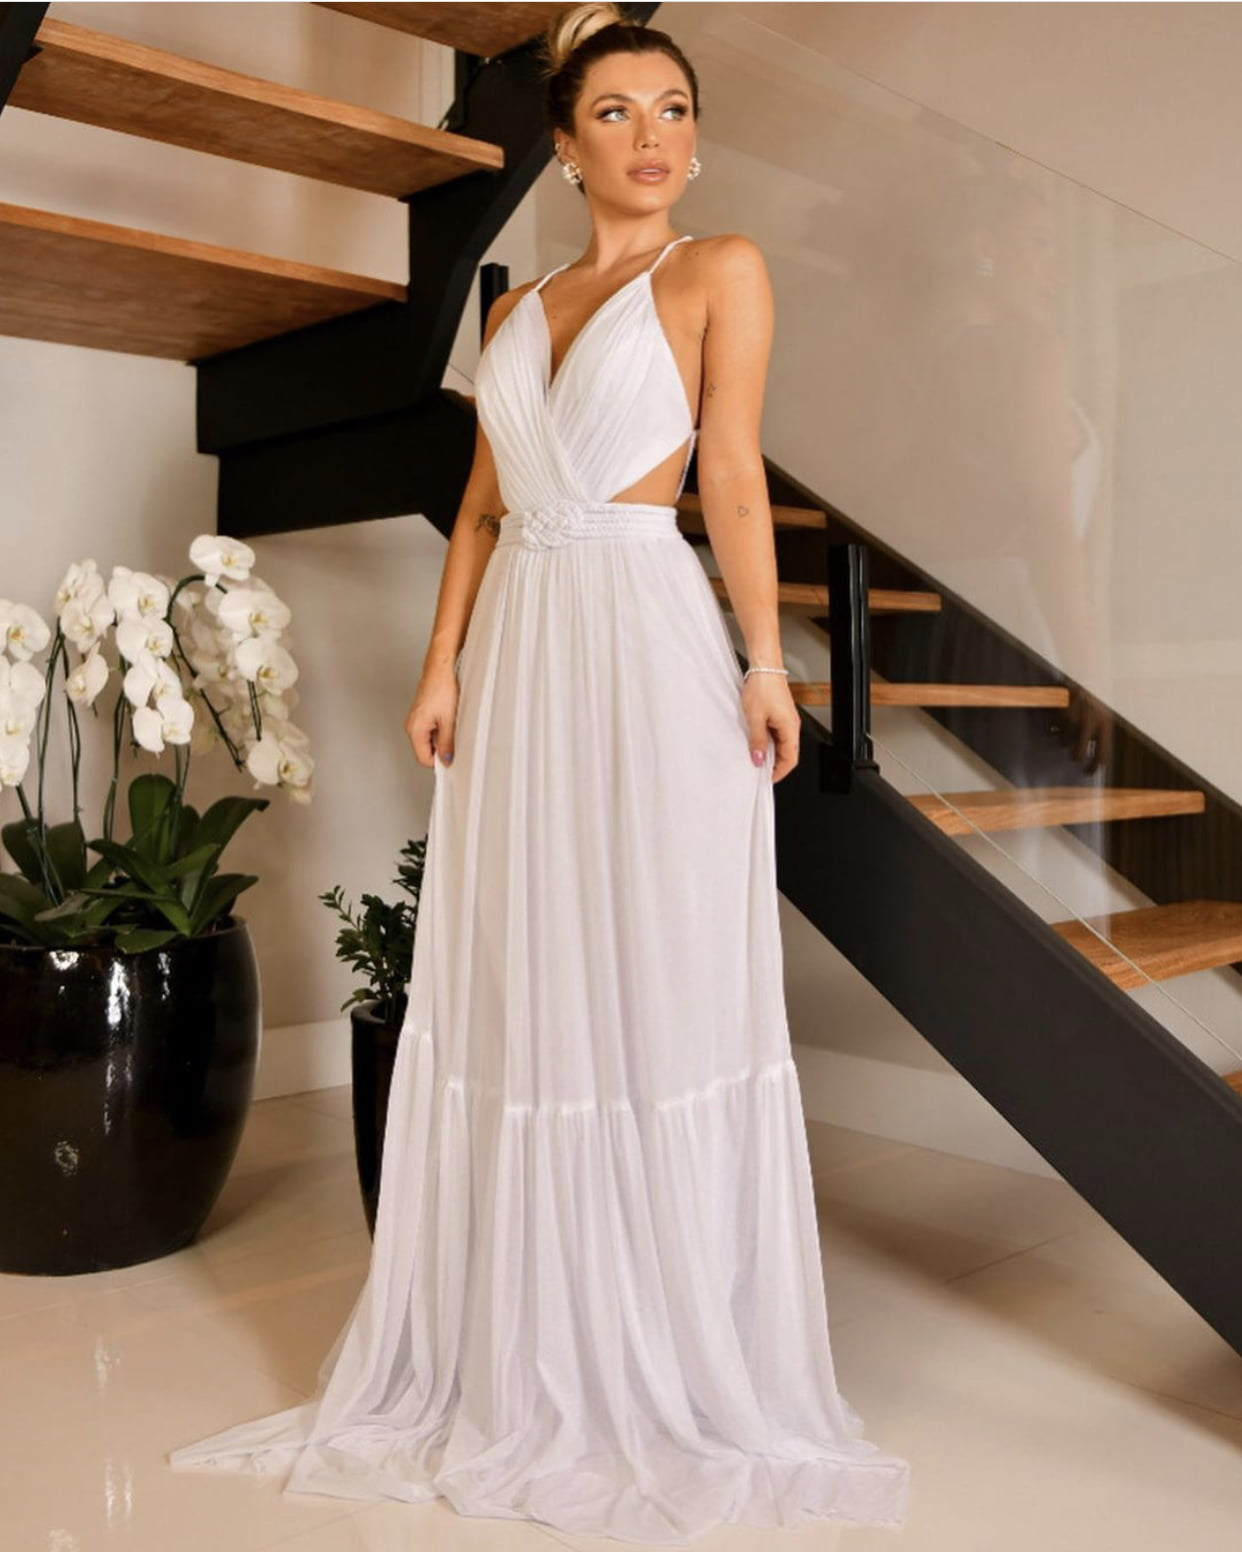 Vestido Branco Longo Busto Estruturado e Alças Finas Cruzadas nas Costas